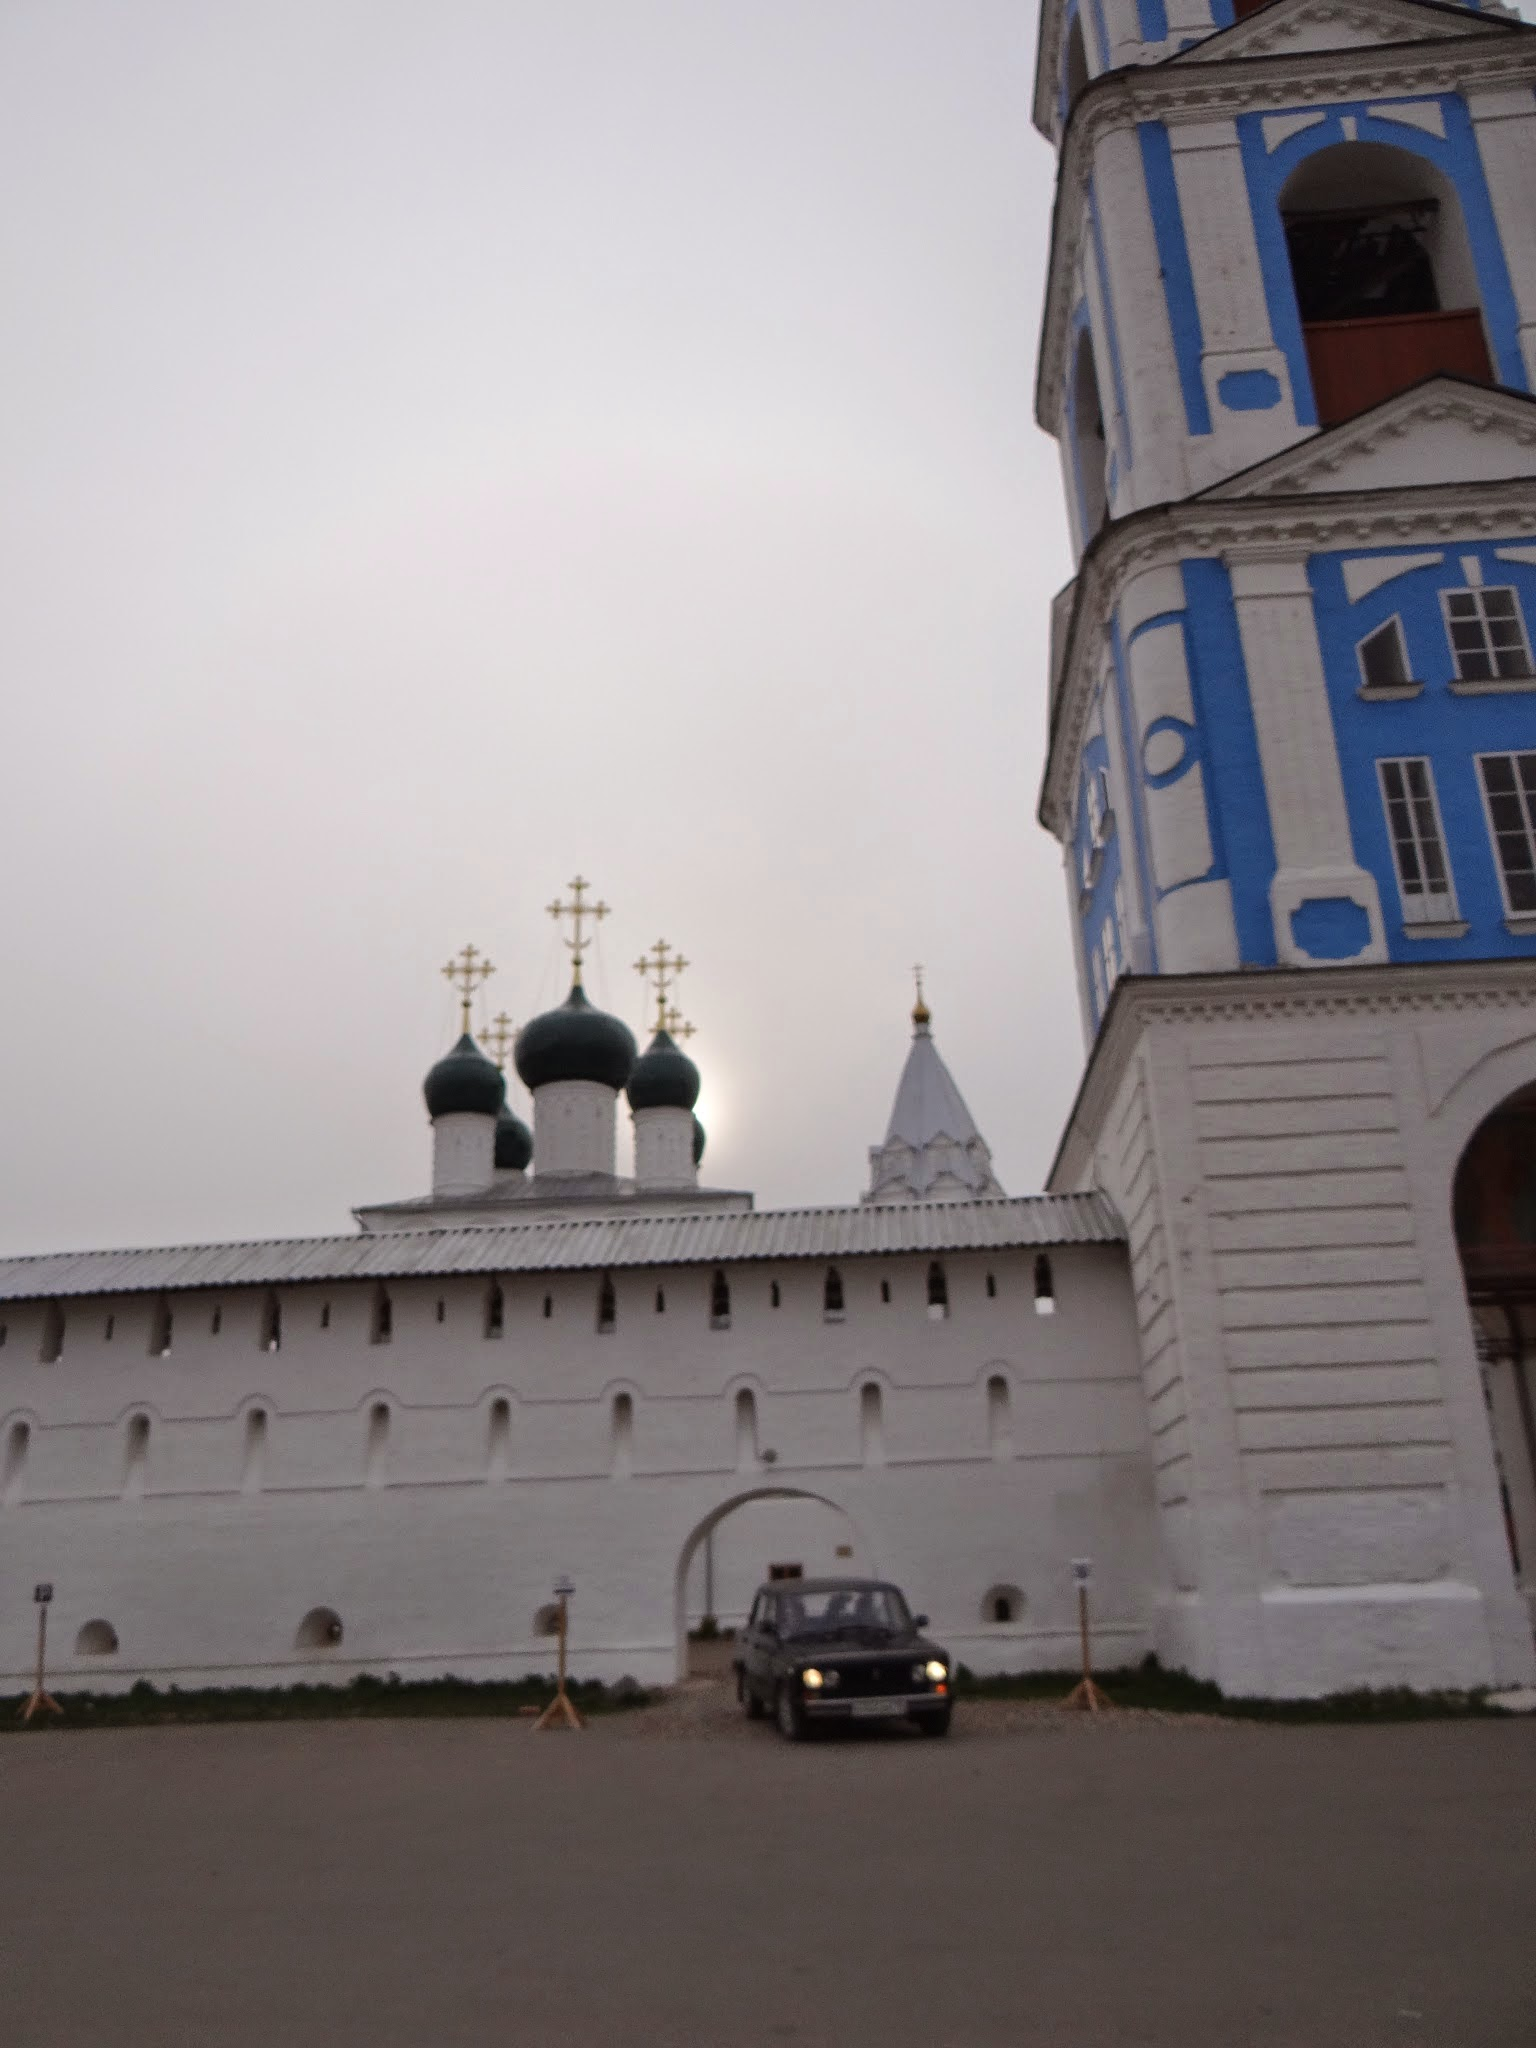 nikitisky monastir pereslavl zalessky.jpg